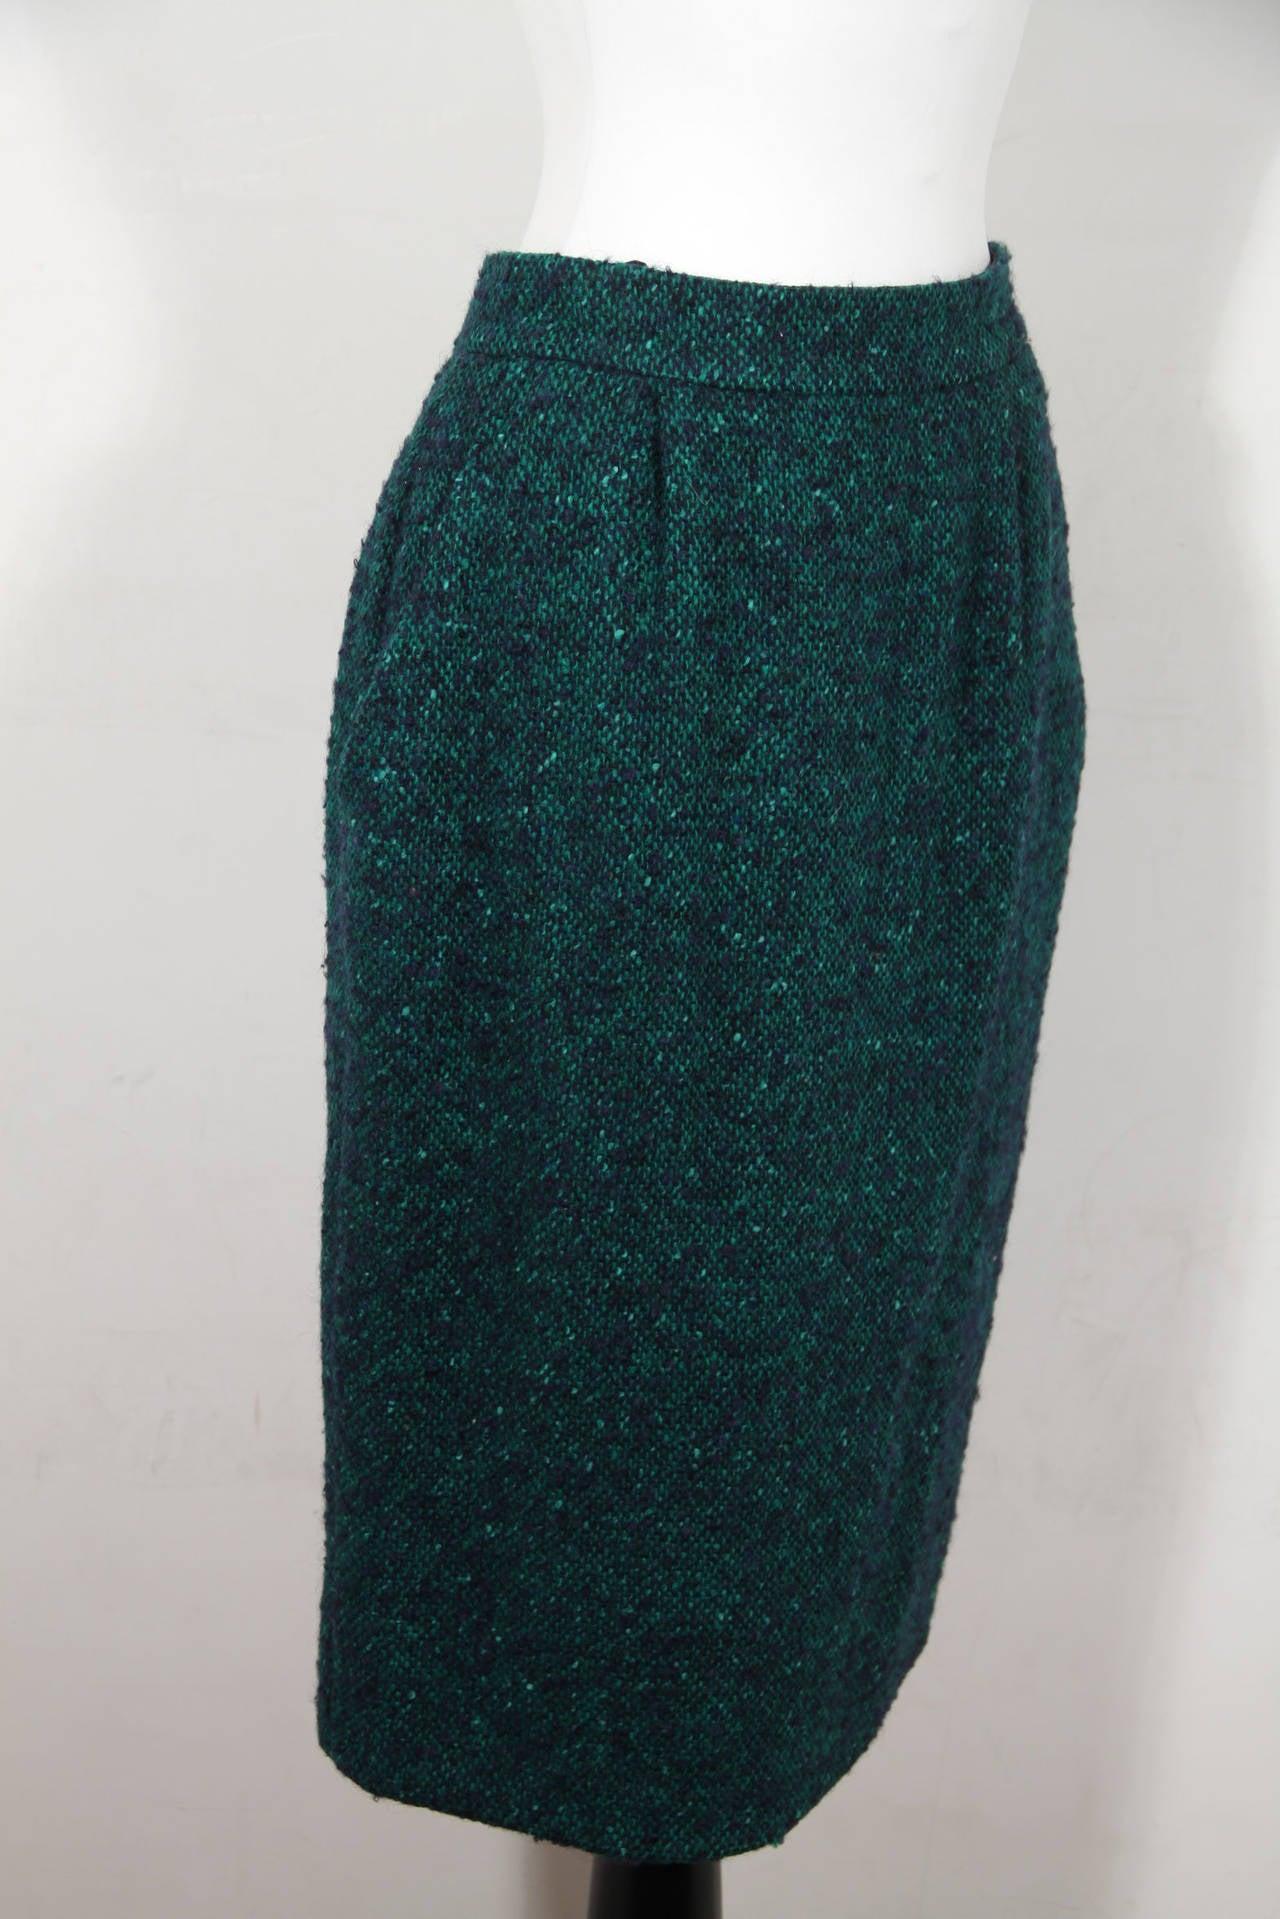 ANDREA ODICINI Italian VINTAGE Green Tweed SUIT Coat & Skirt SET Sz 40 IT For Sale 3